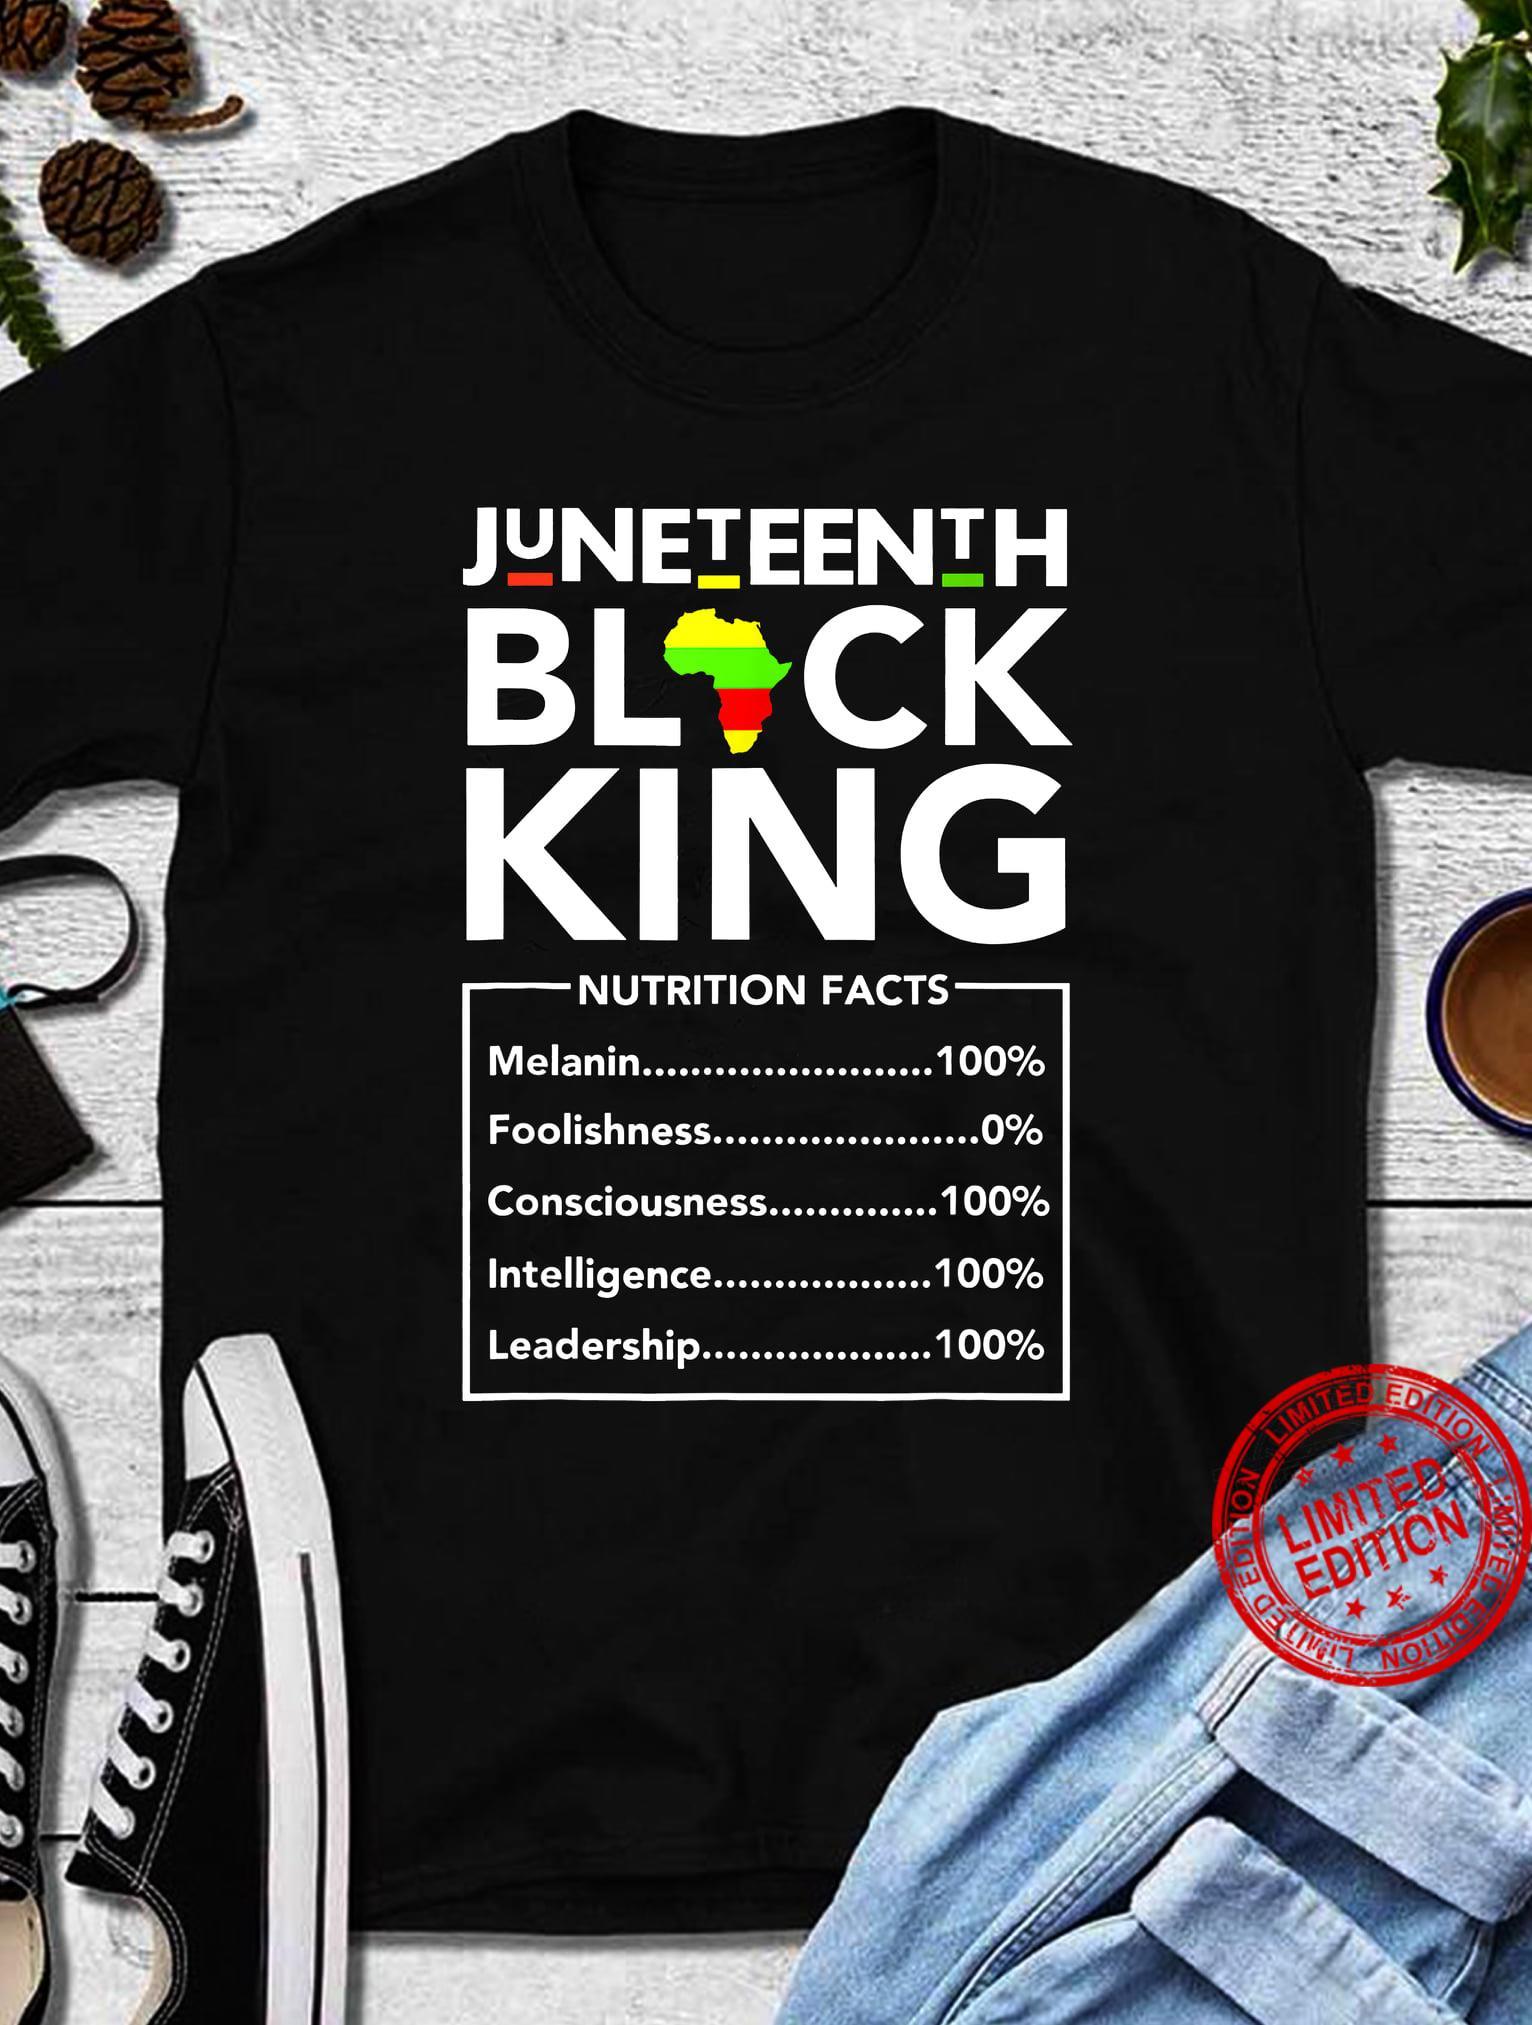 Juneteenth Black King Nutrition Facts Shirt